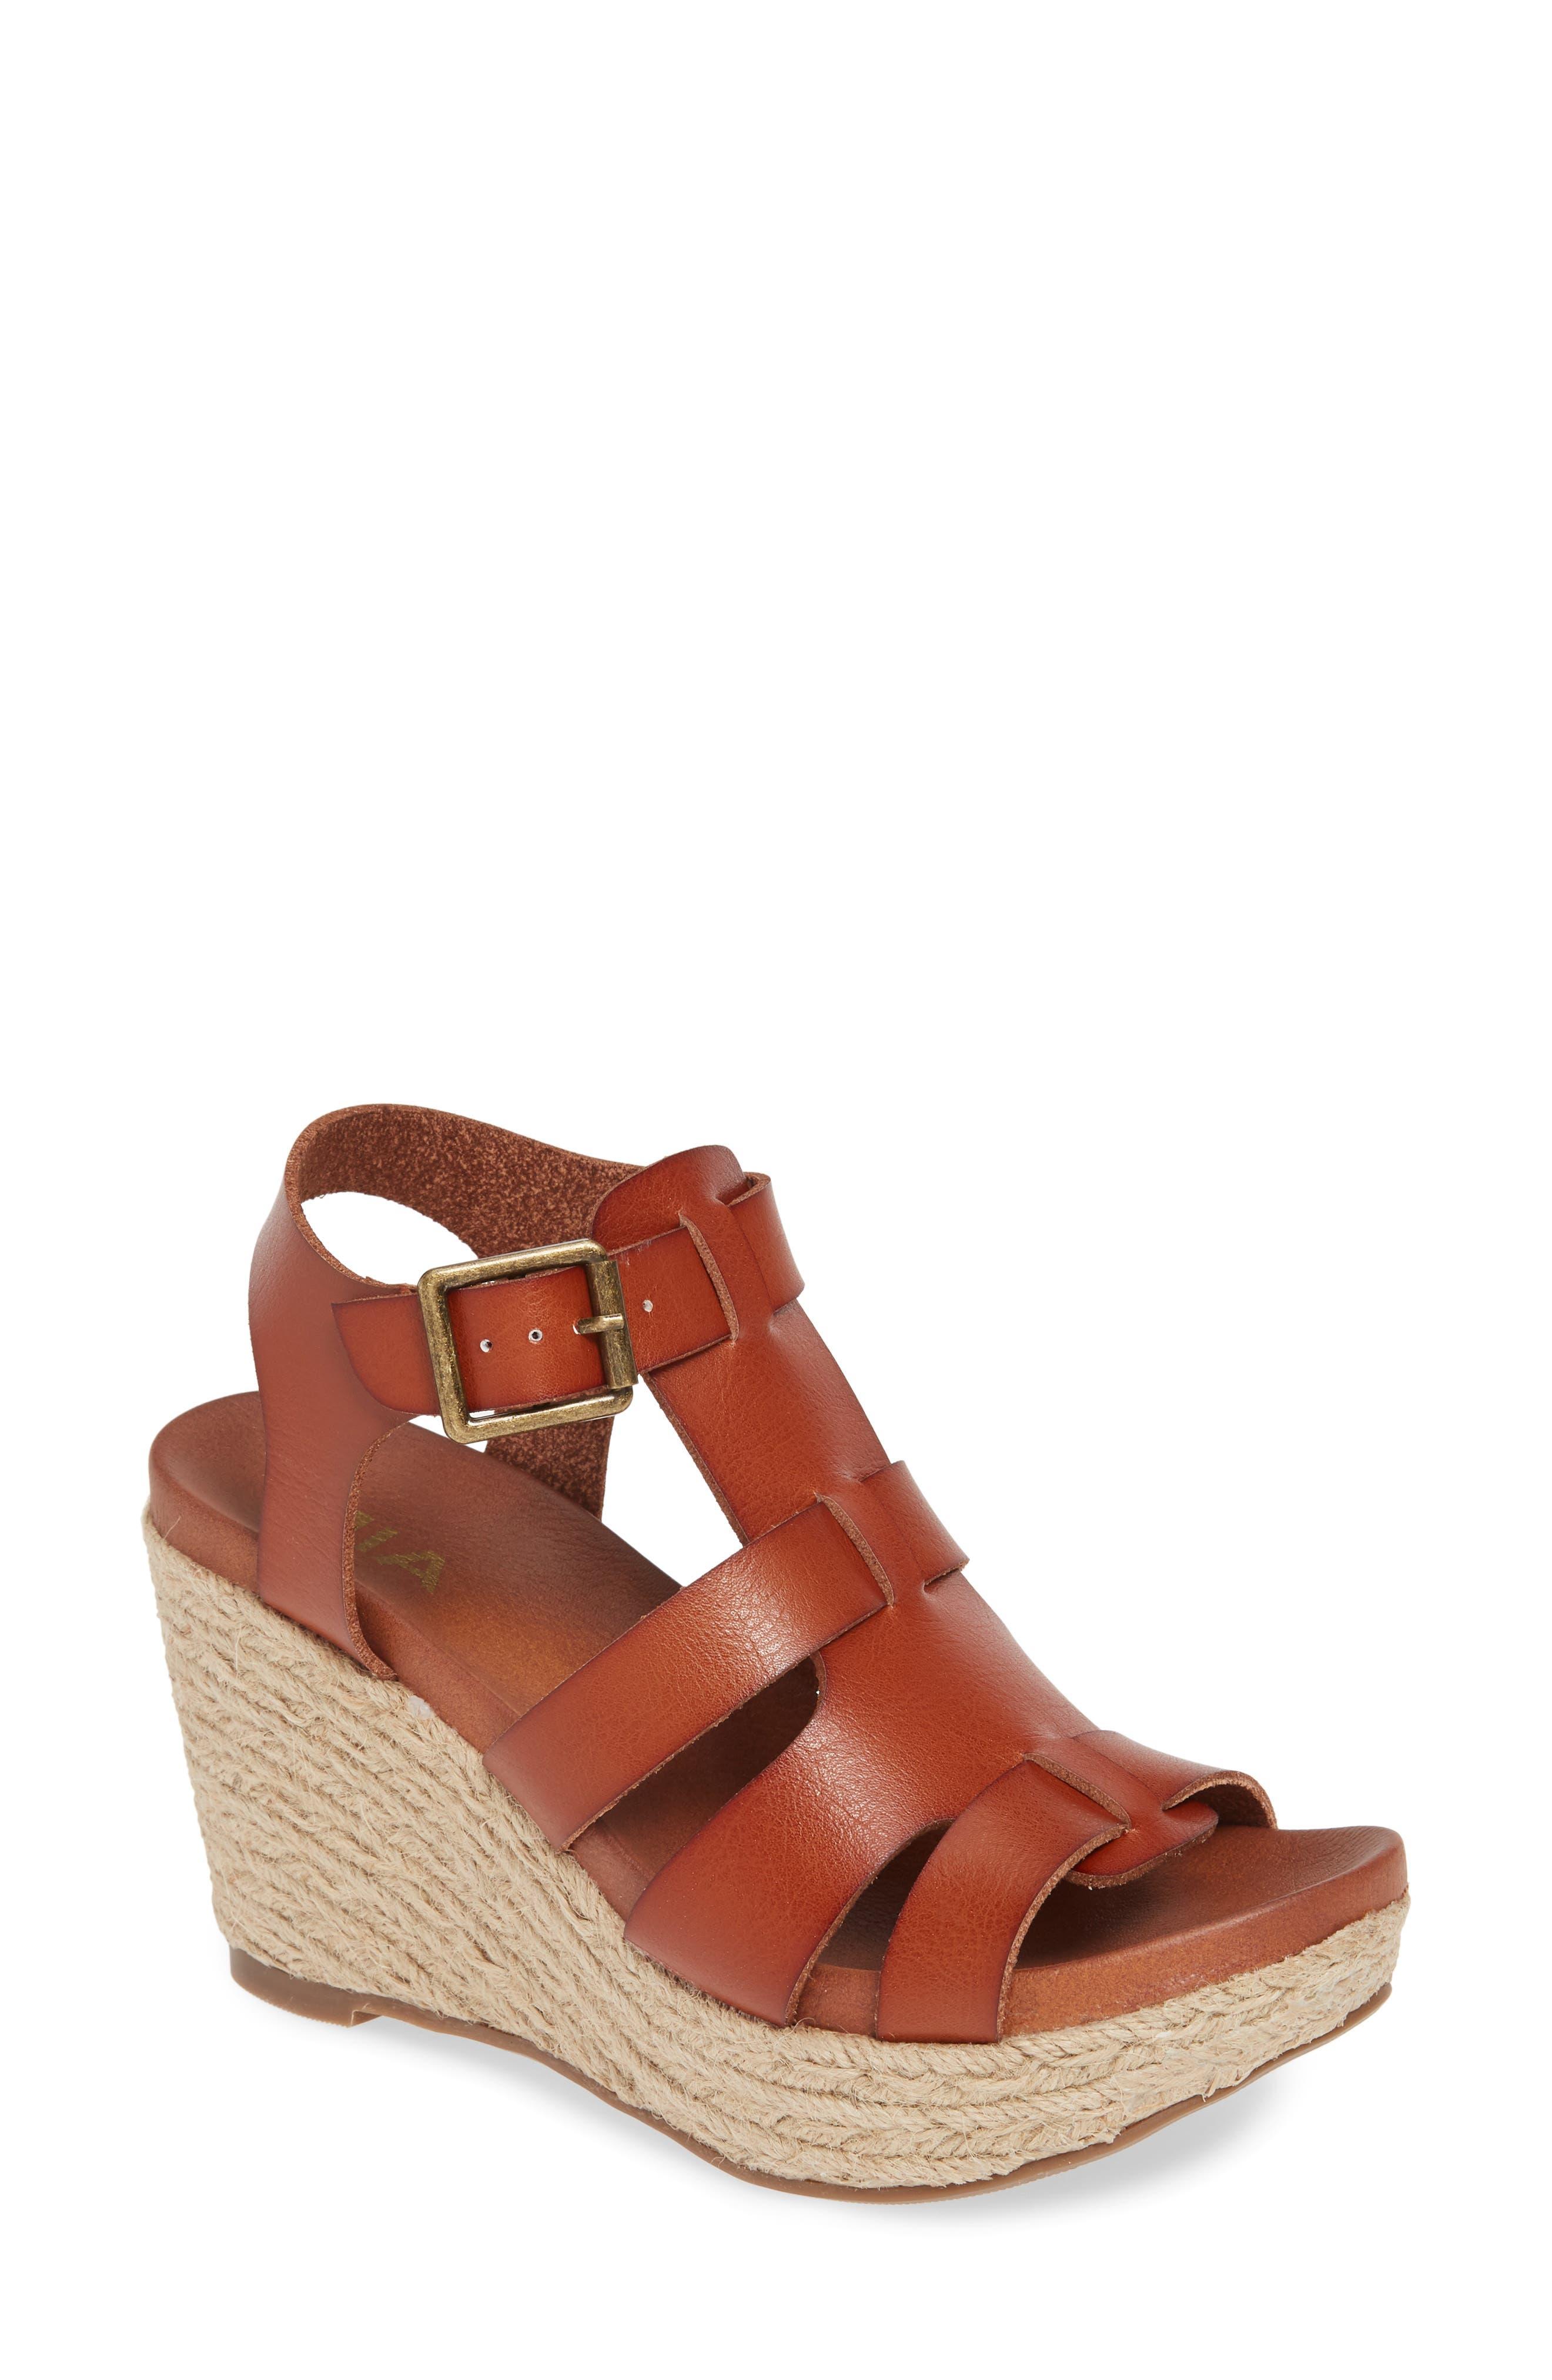 4a646bd7eaa MIA Sale, Women's Shoes